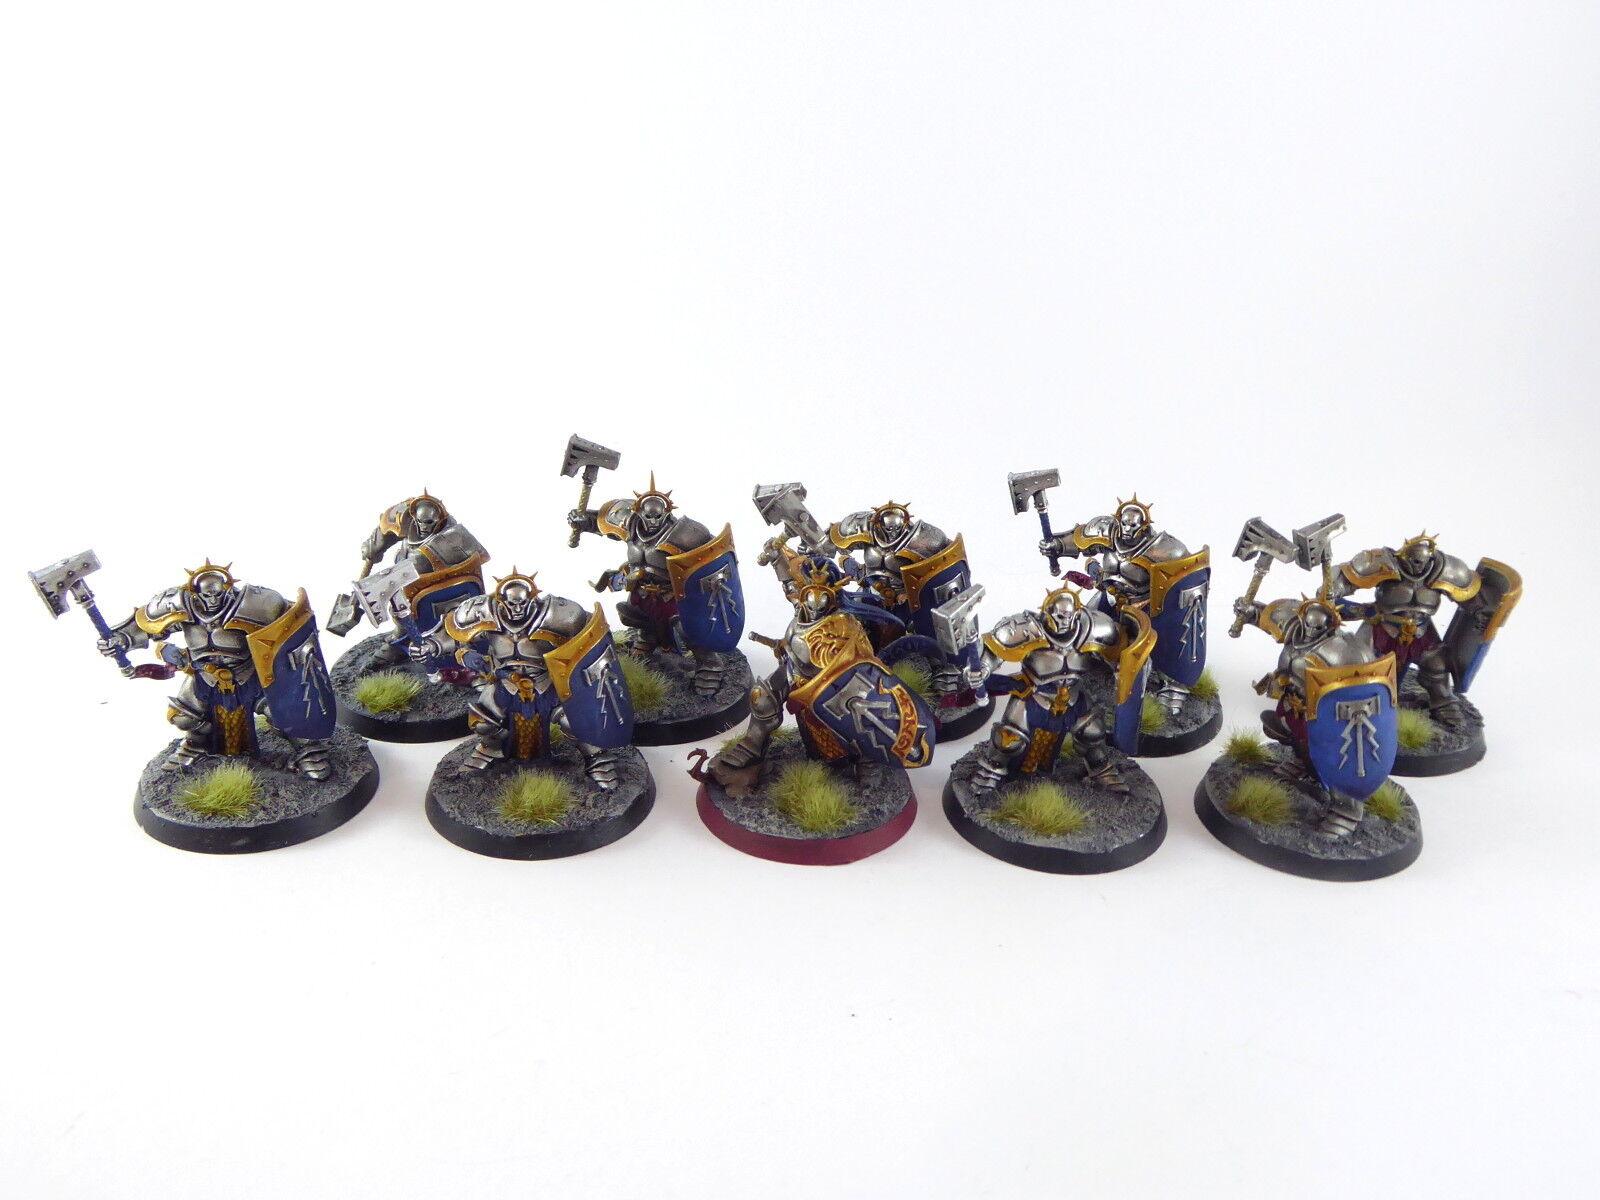 10  x dei Liberators stormcast Eternals Warhammer fantasyc-DIPINTO bene -  vendita scontata online di factory outlet